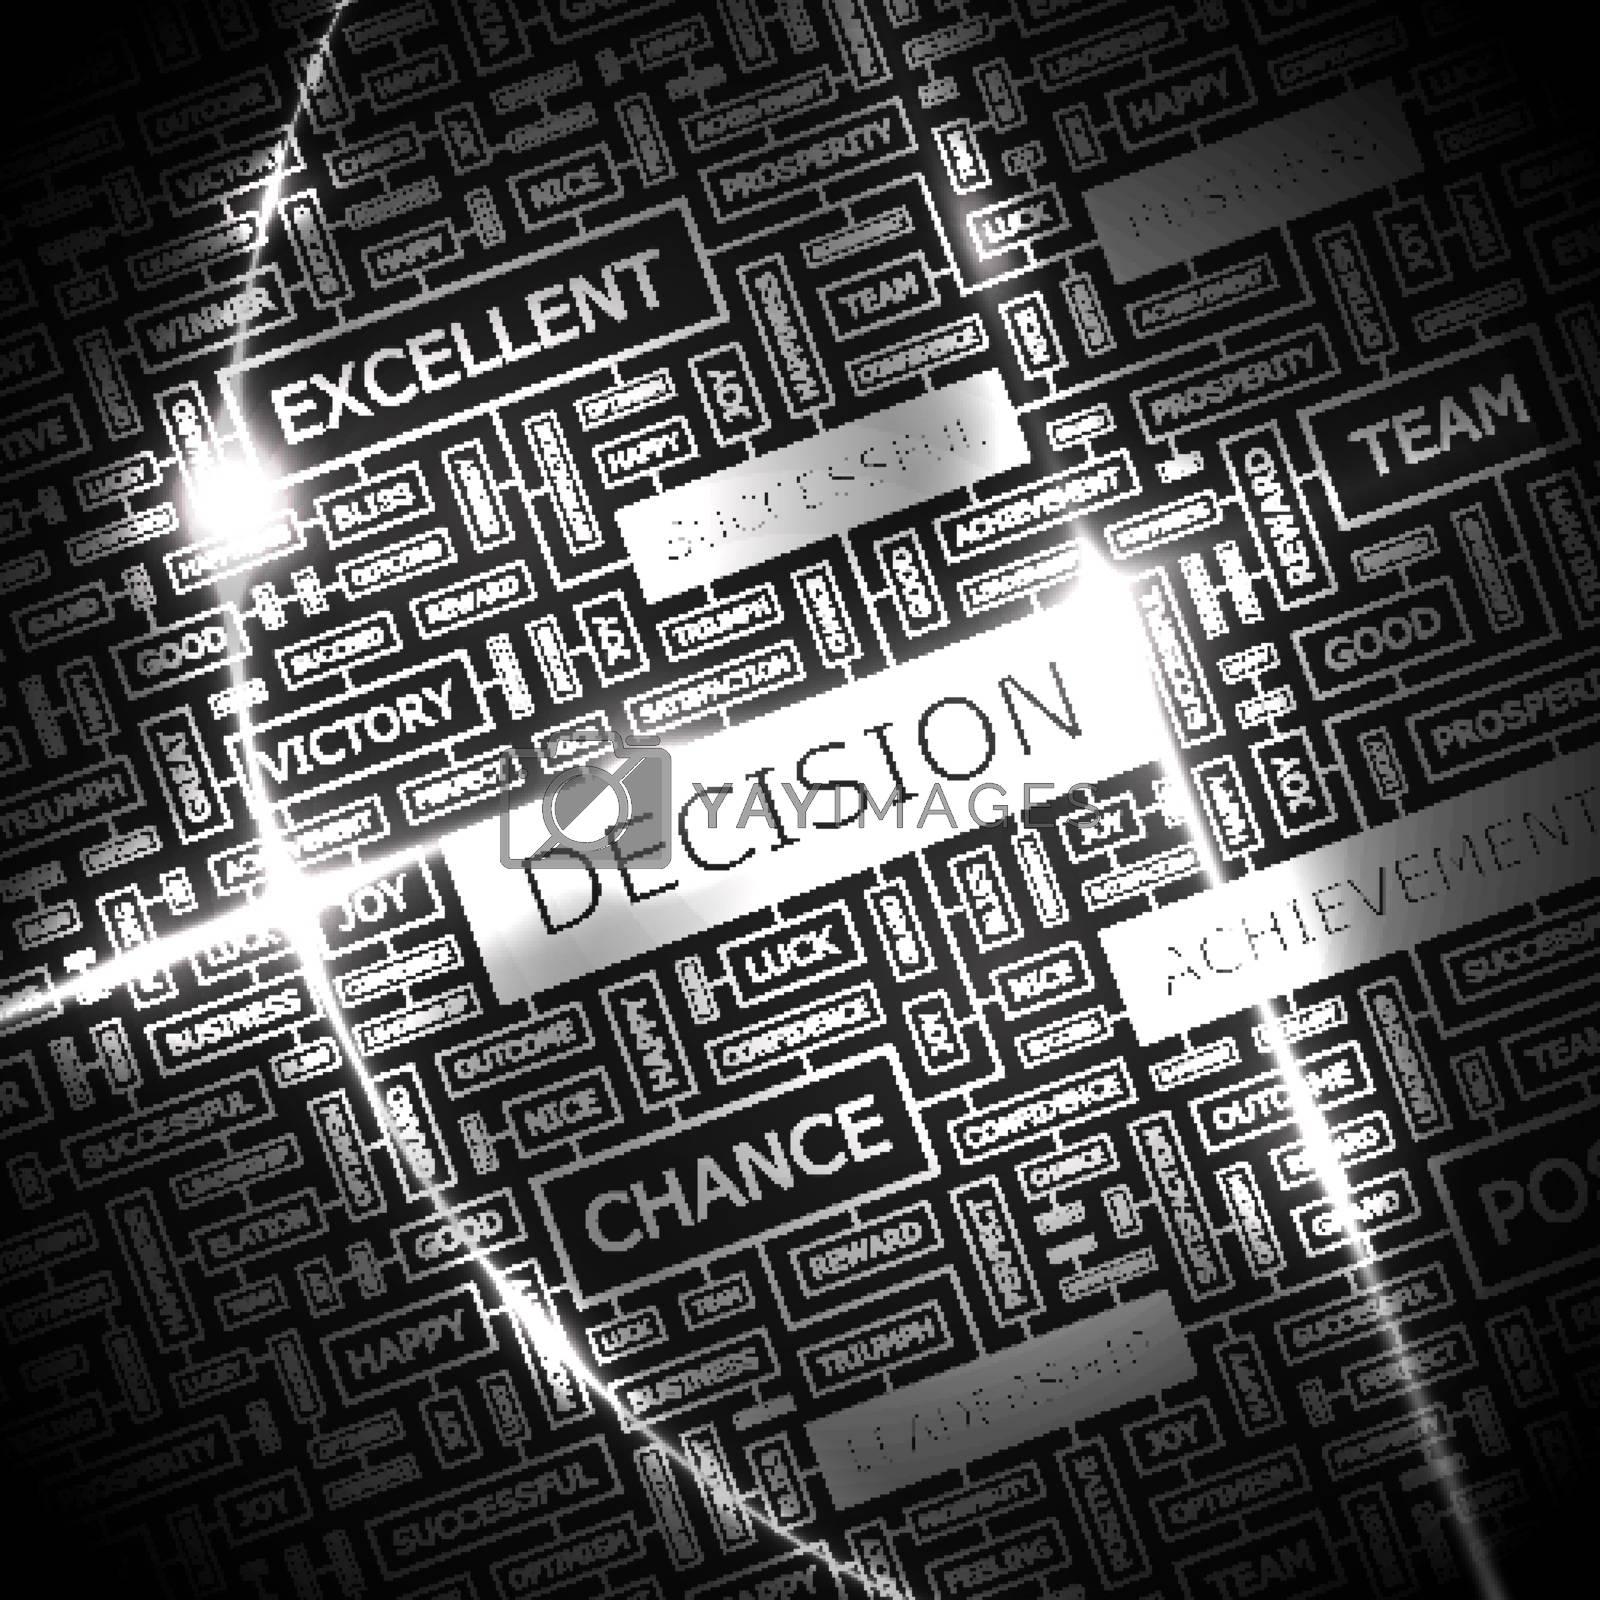 DECISION. Background concept wordcloud illustration. Print concept word cloud. Graphic collage.